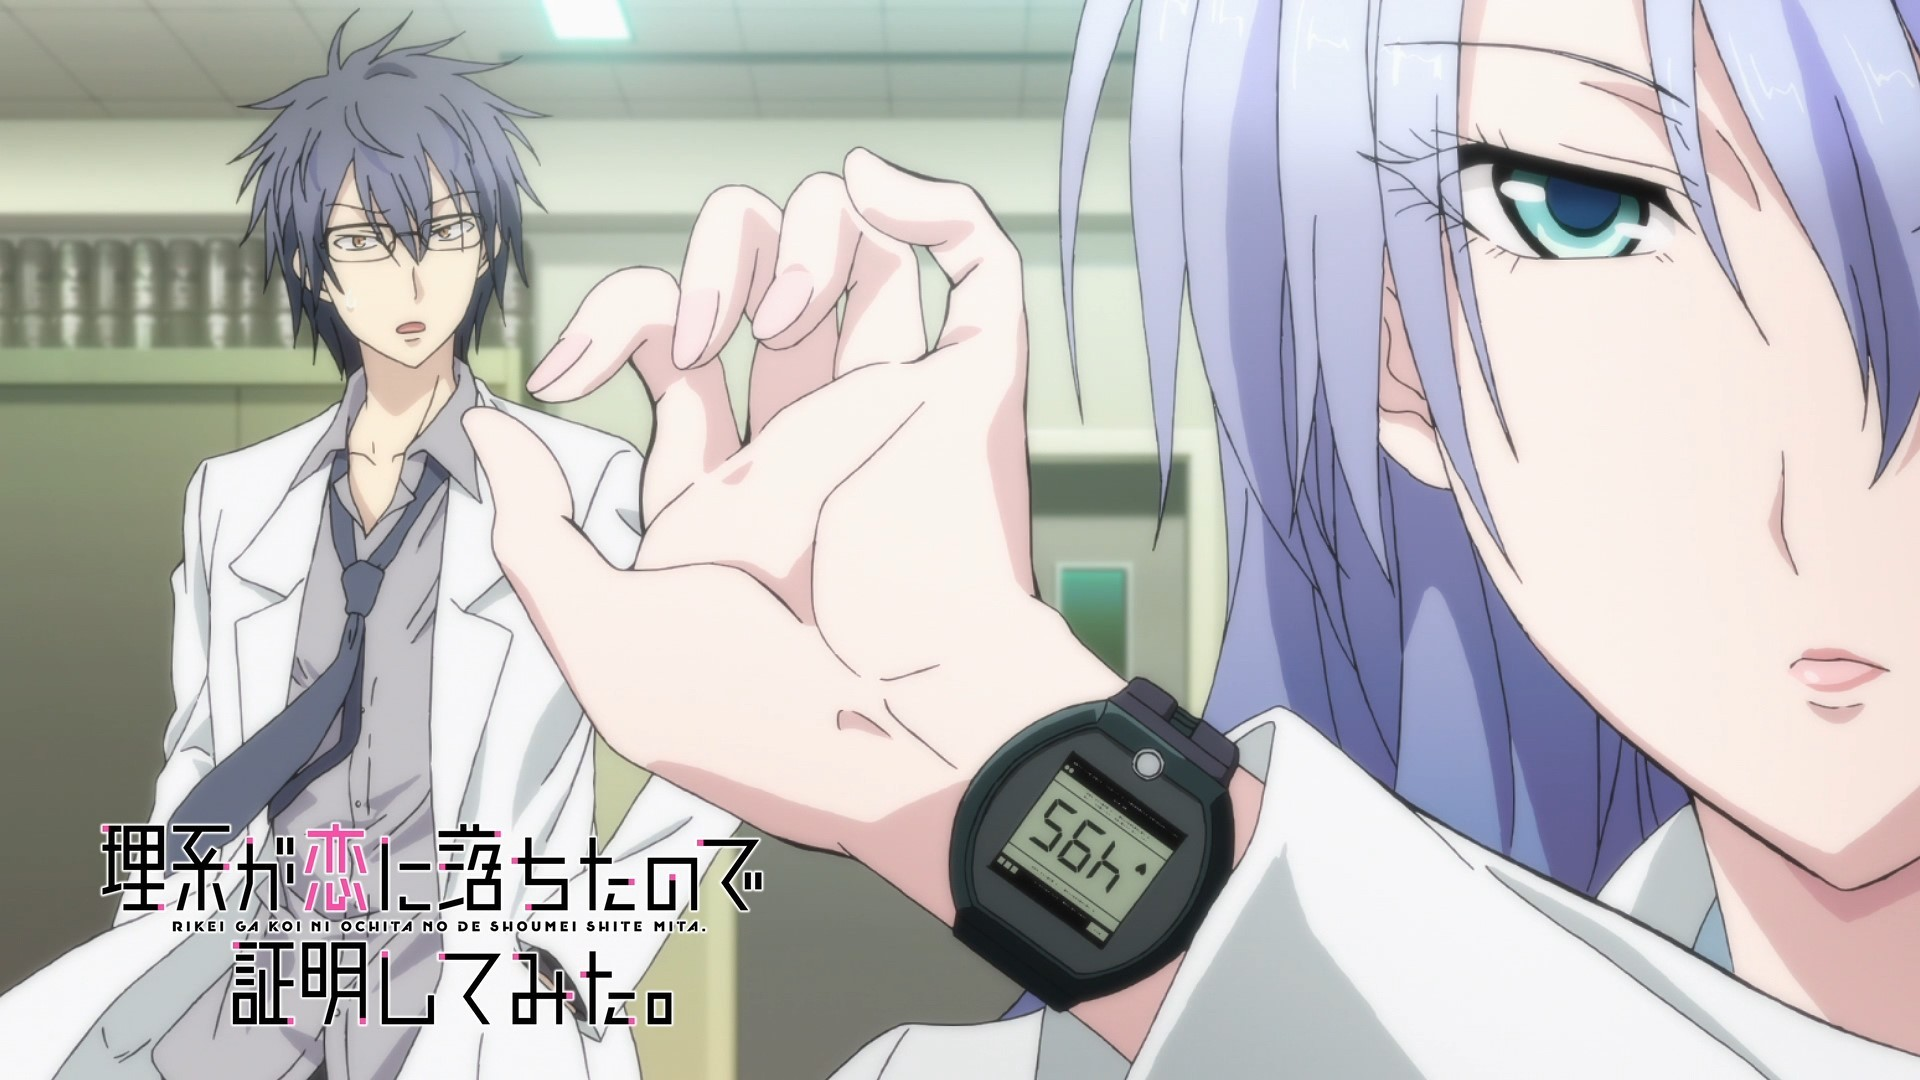 Rikei Ga Koi Episode 04 Eyecatch